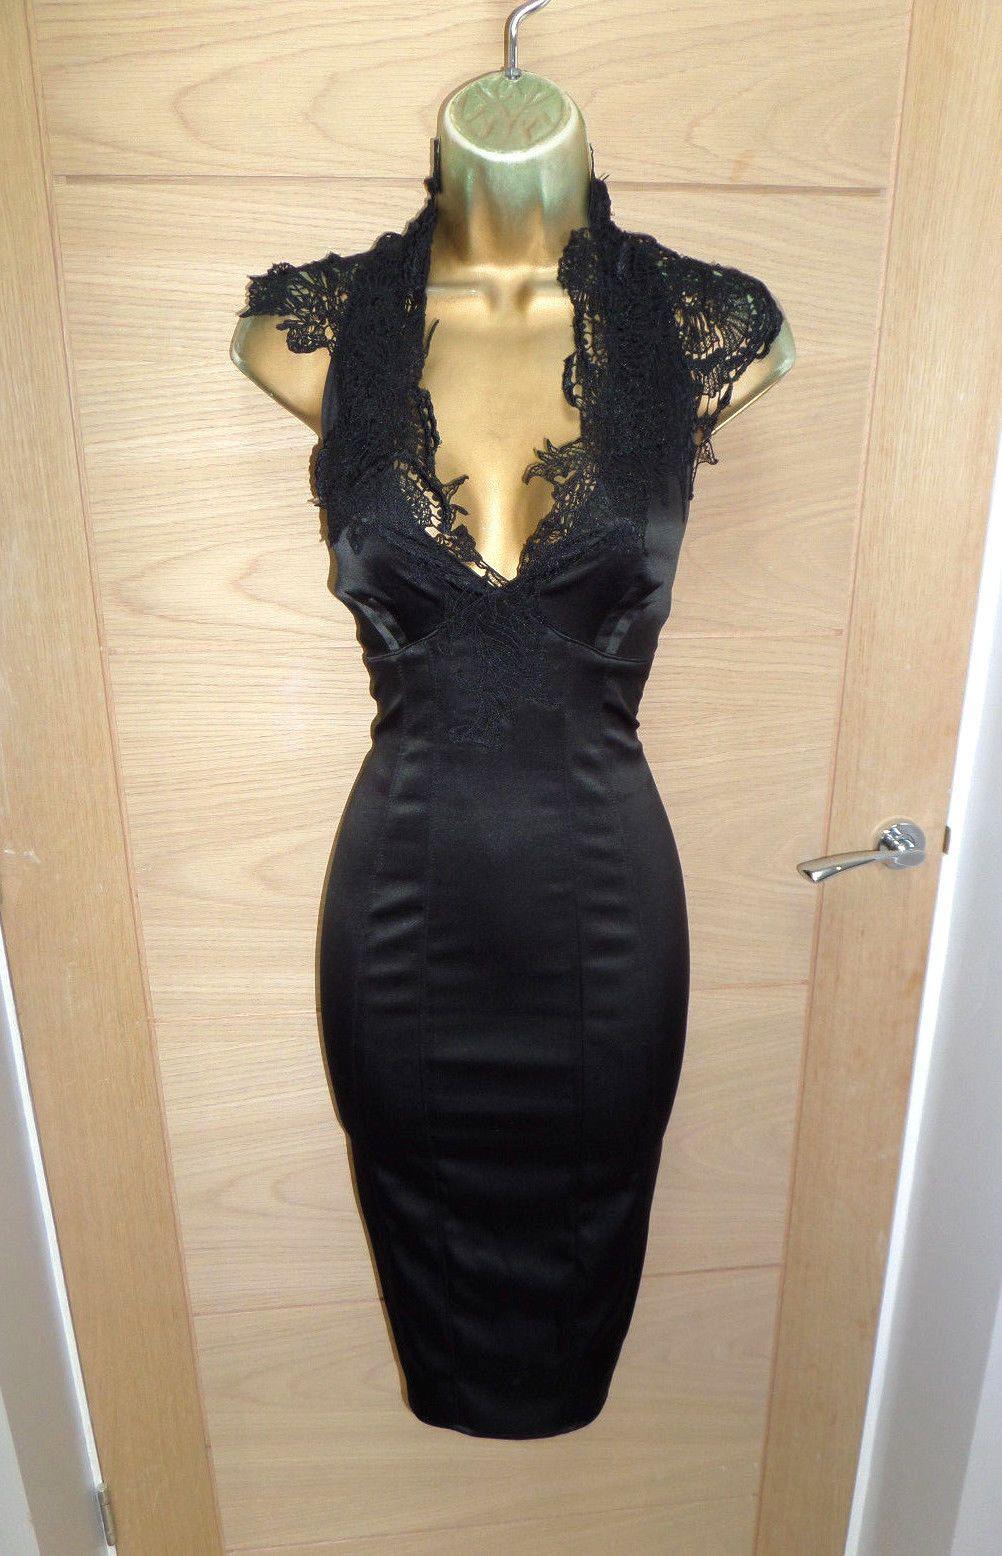 25486b62 KAREN MILLEN VICTORIAN LACE CORSET WIGGLE DRESS UK 14 42 HOURGLASS COCKTAIL